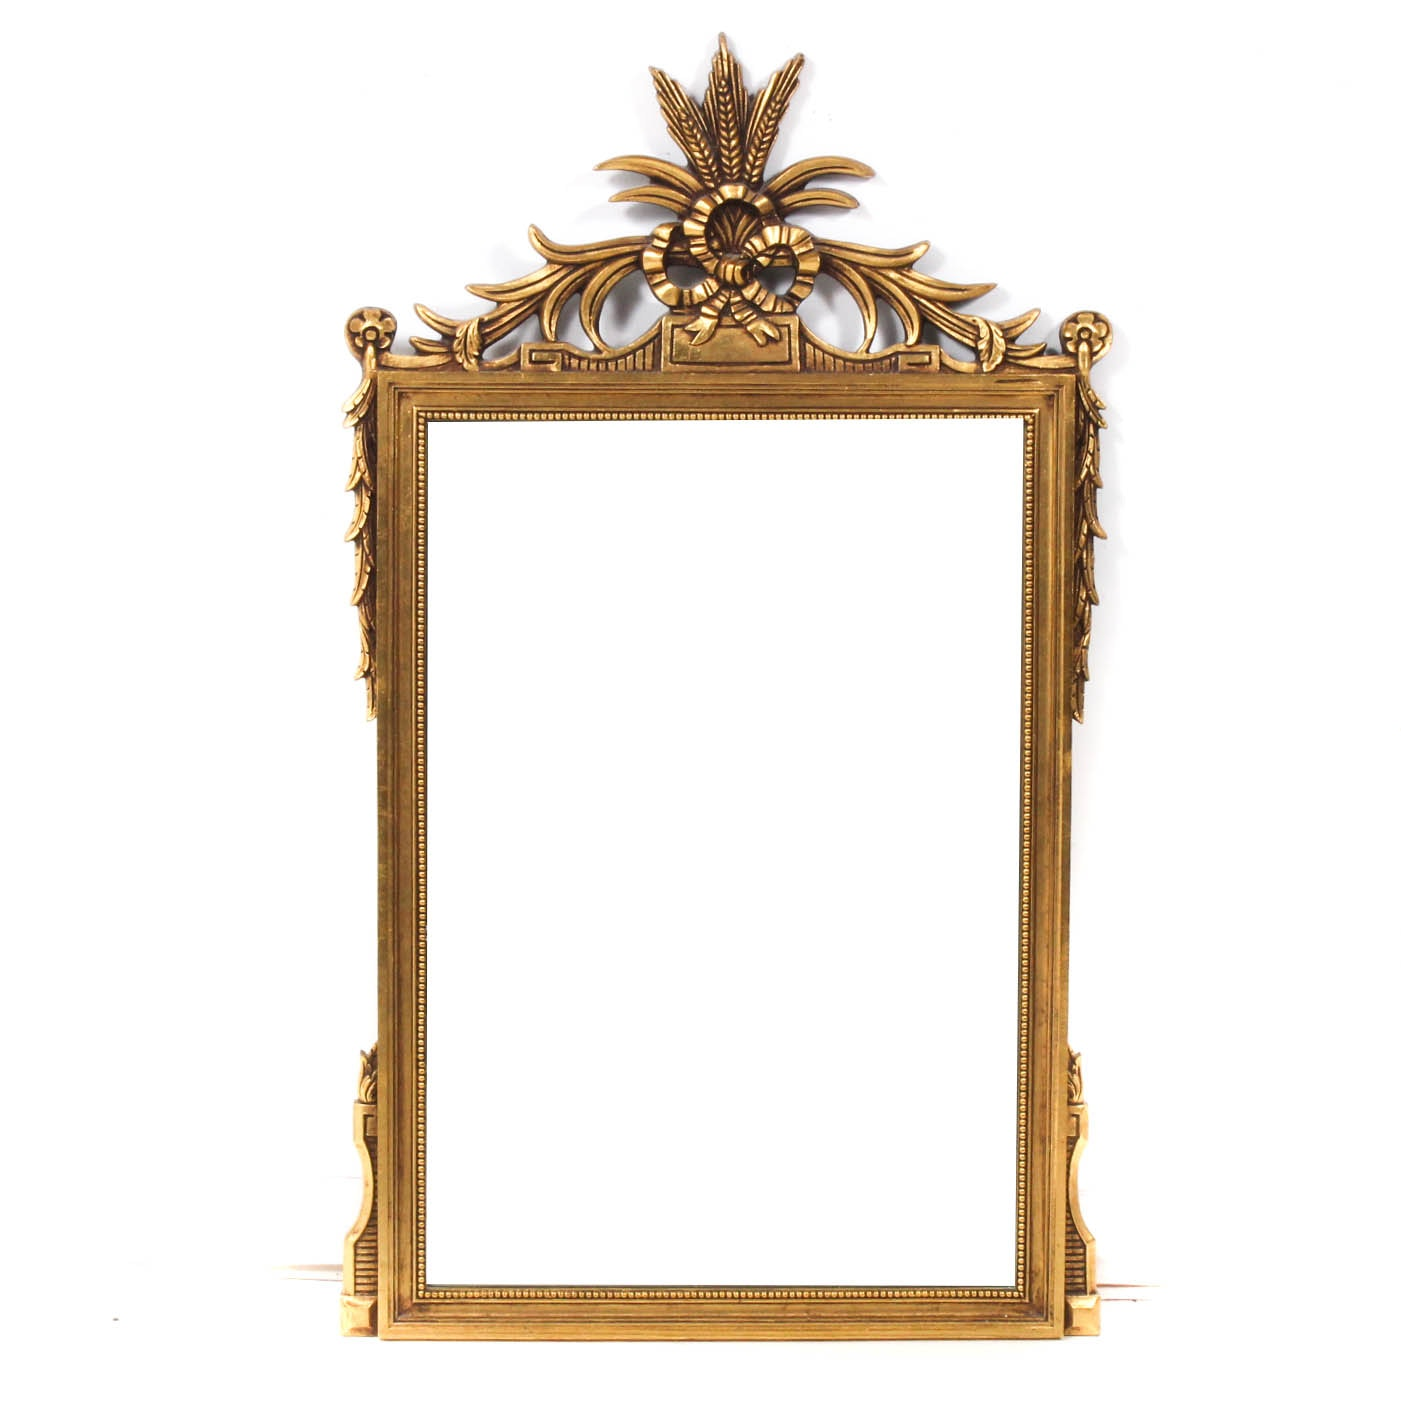 Vintage Regency Style Gilt Wood Framed Wall Mirror